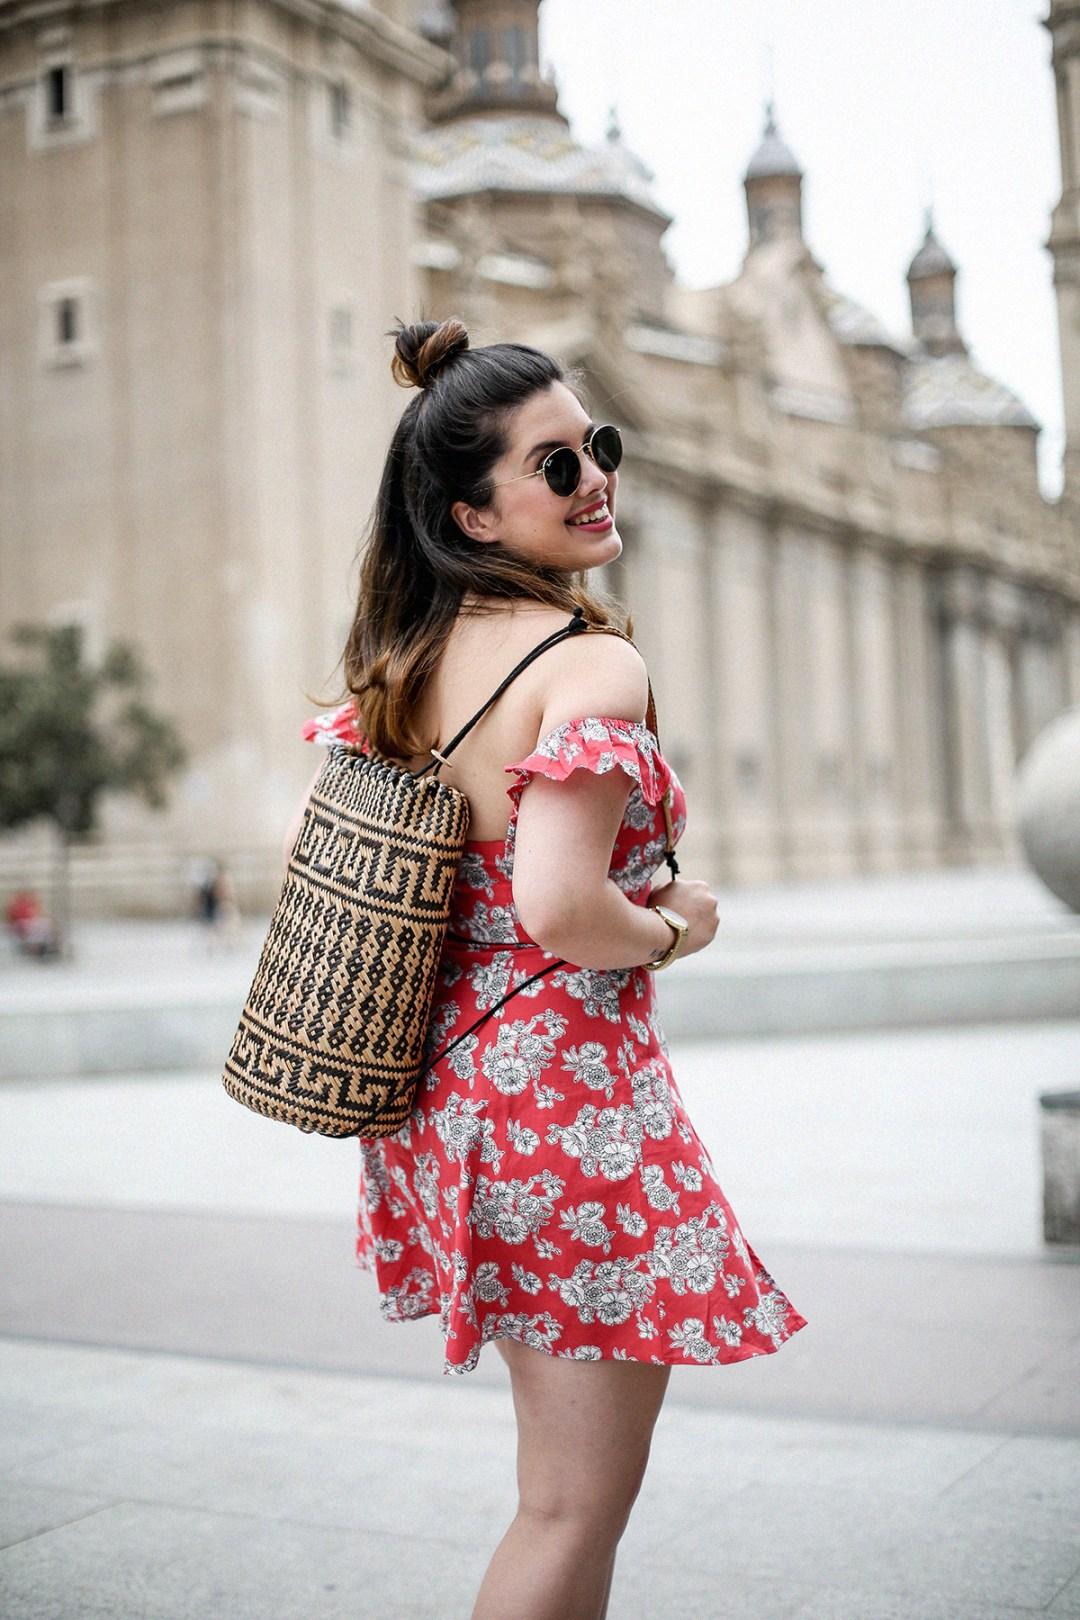 vestido-hombros-al-aire-asos-mochila-ratan-zaragoza-travel5